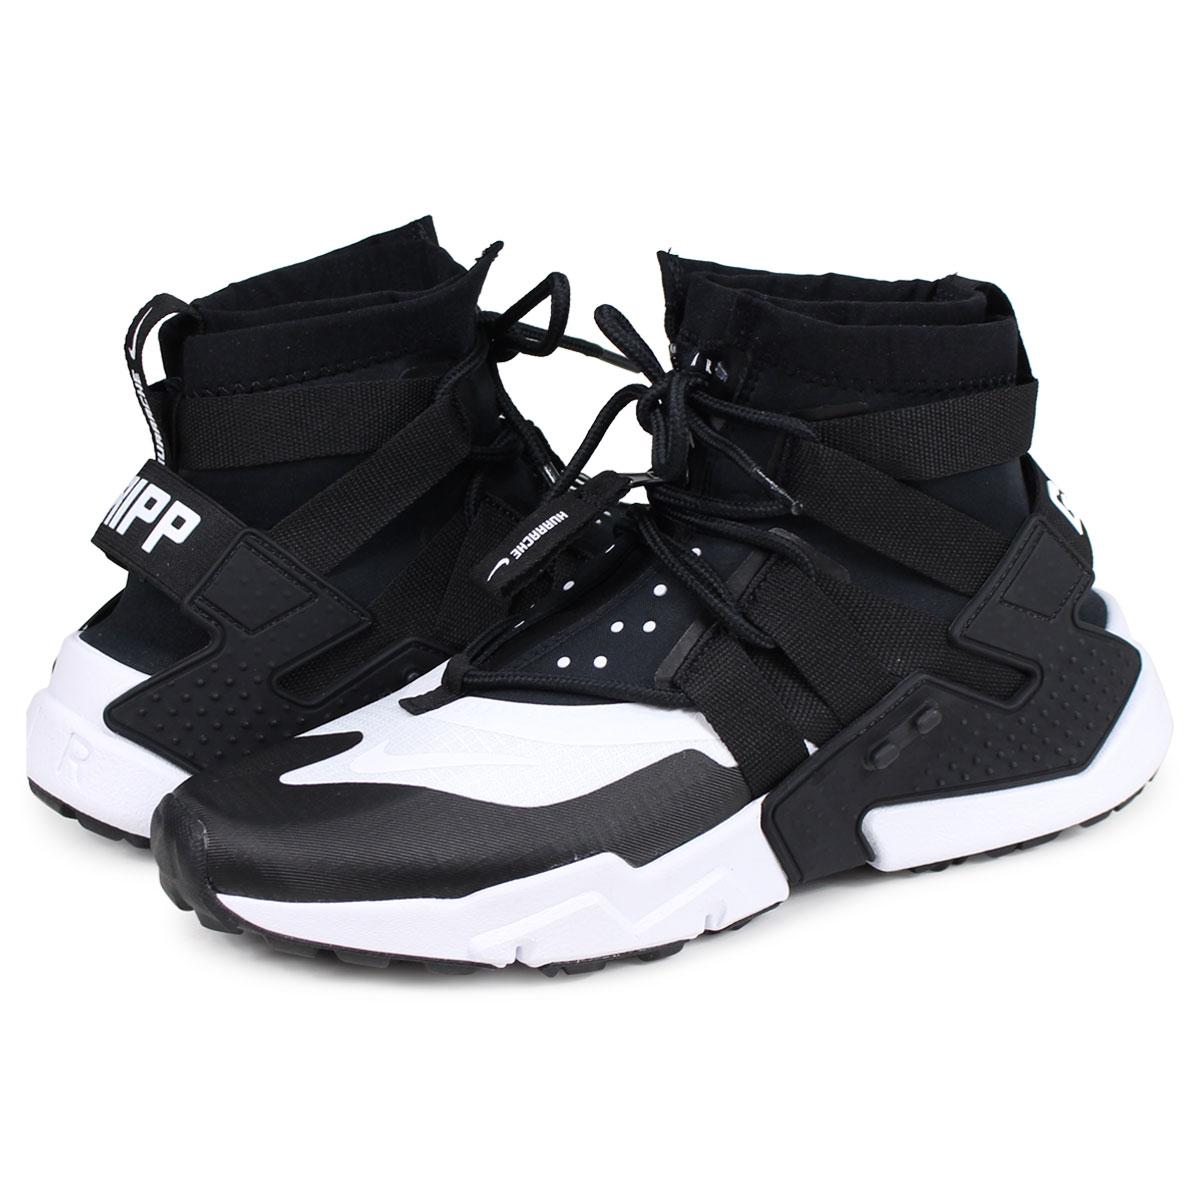 best sneakers 5b150 eee25 Nike NIKE エアハラチグリップスニーカーメンズ AIR HUARACHE GRIPP black AO1730-005  1 30  Shinnyu load   191